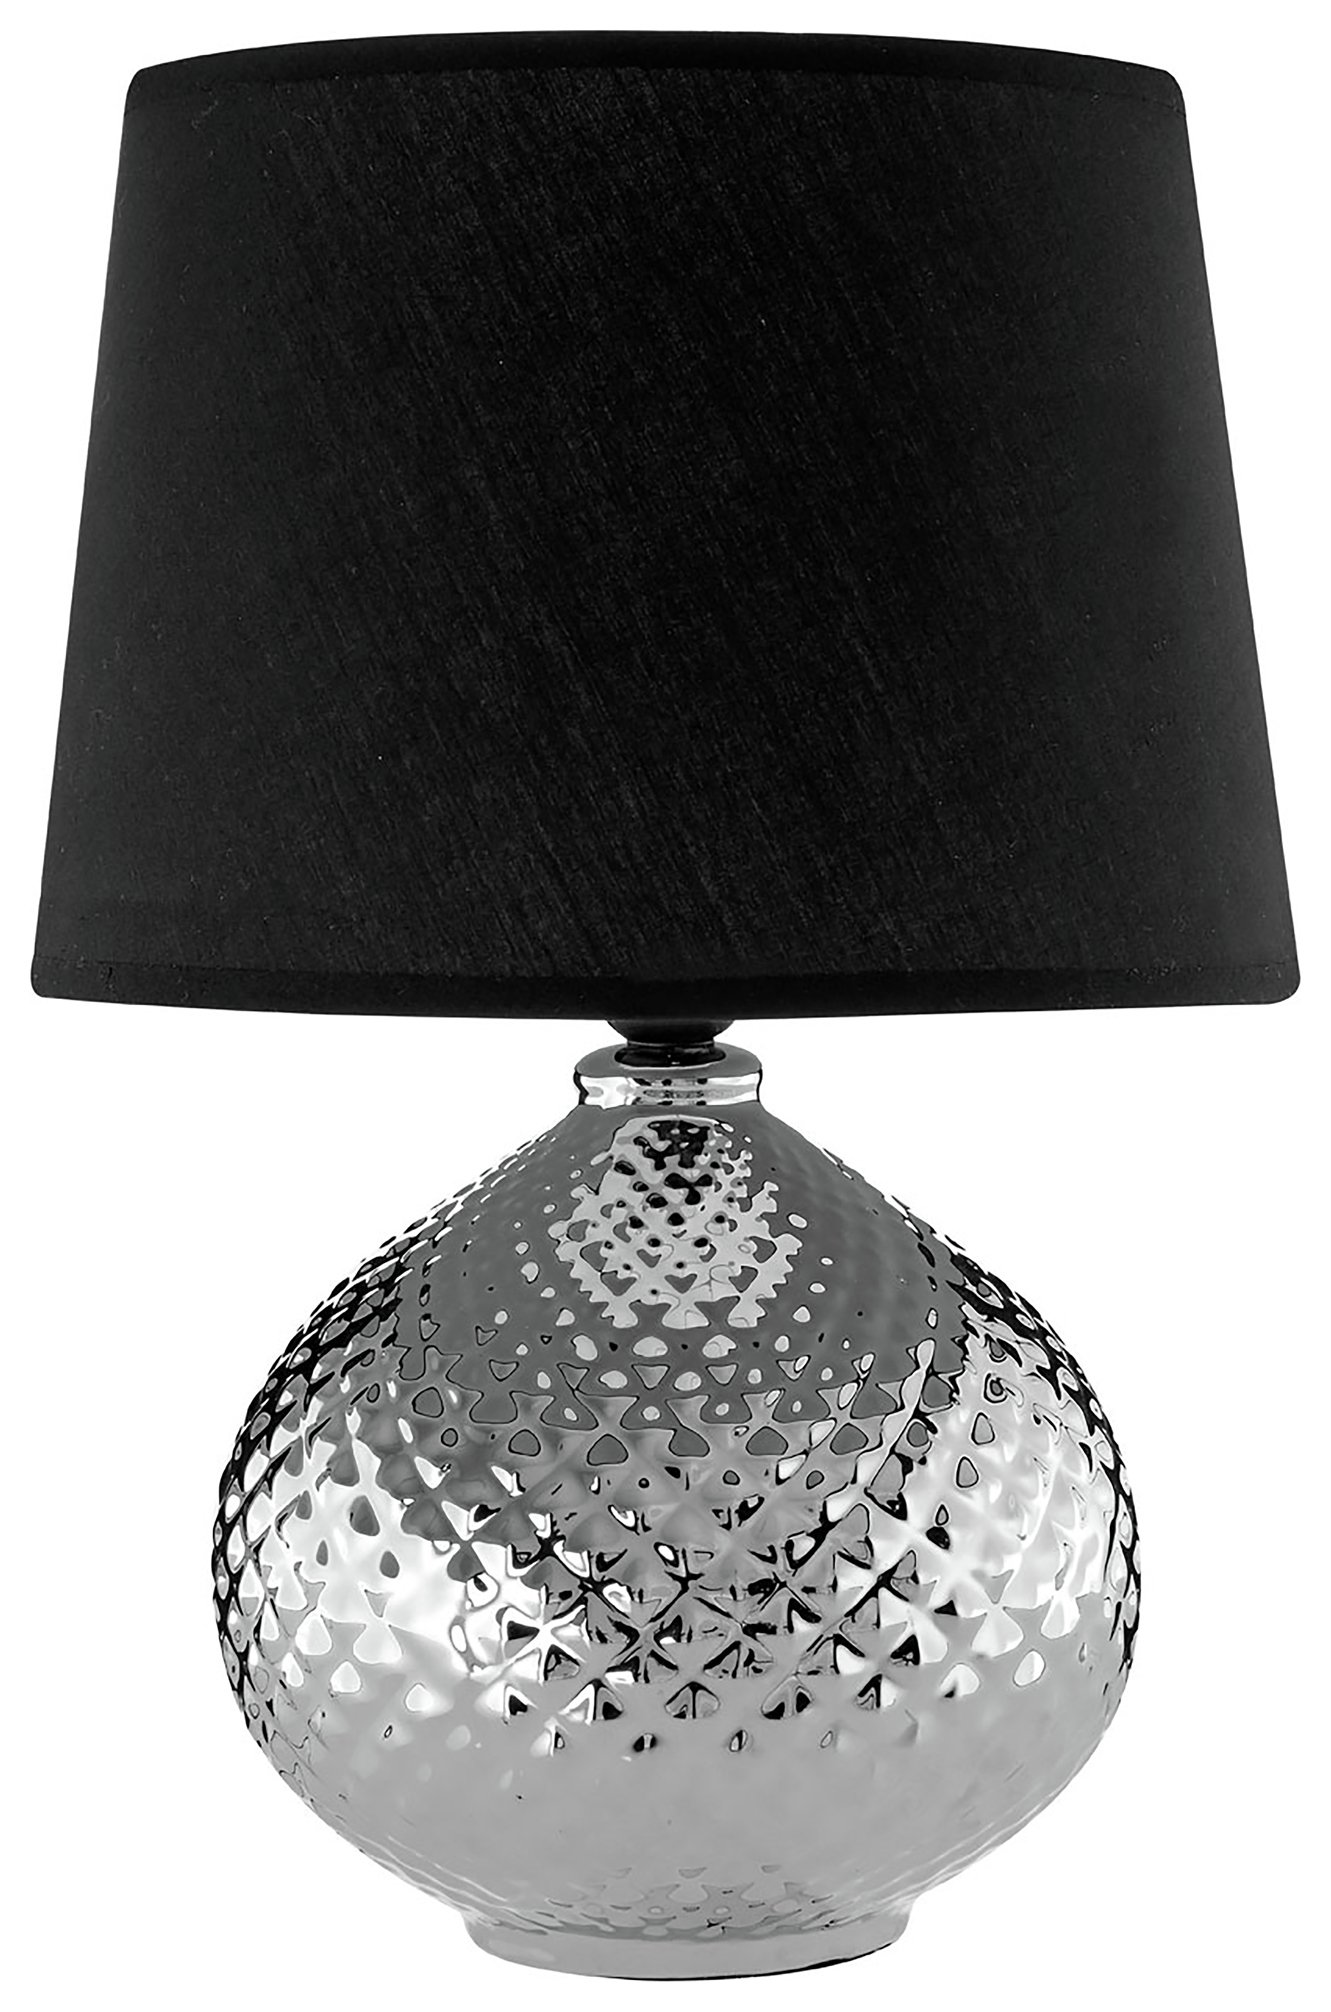 Image of Hetty Ceramic Table Lamp - Silver & Black